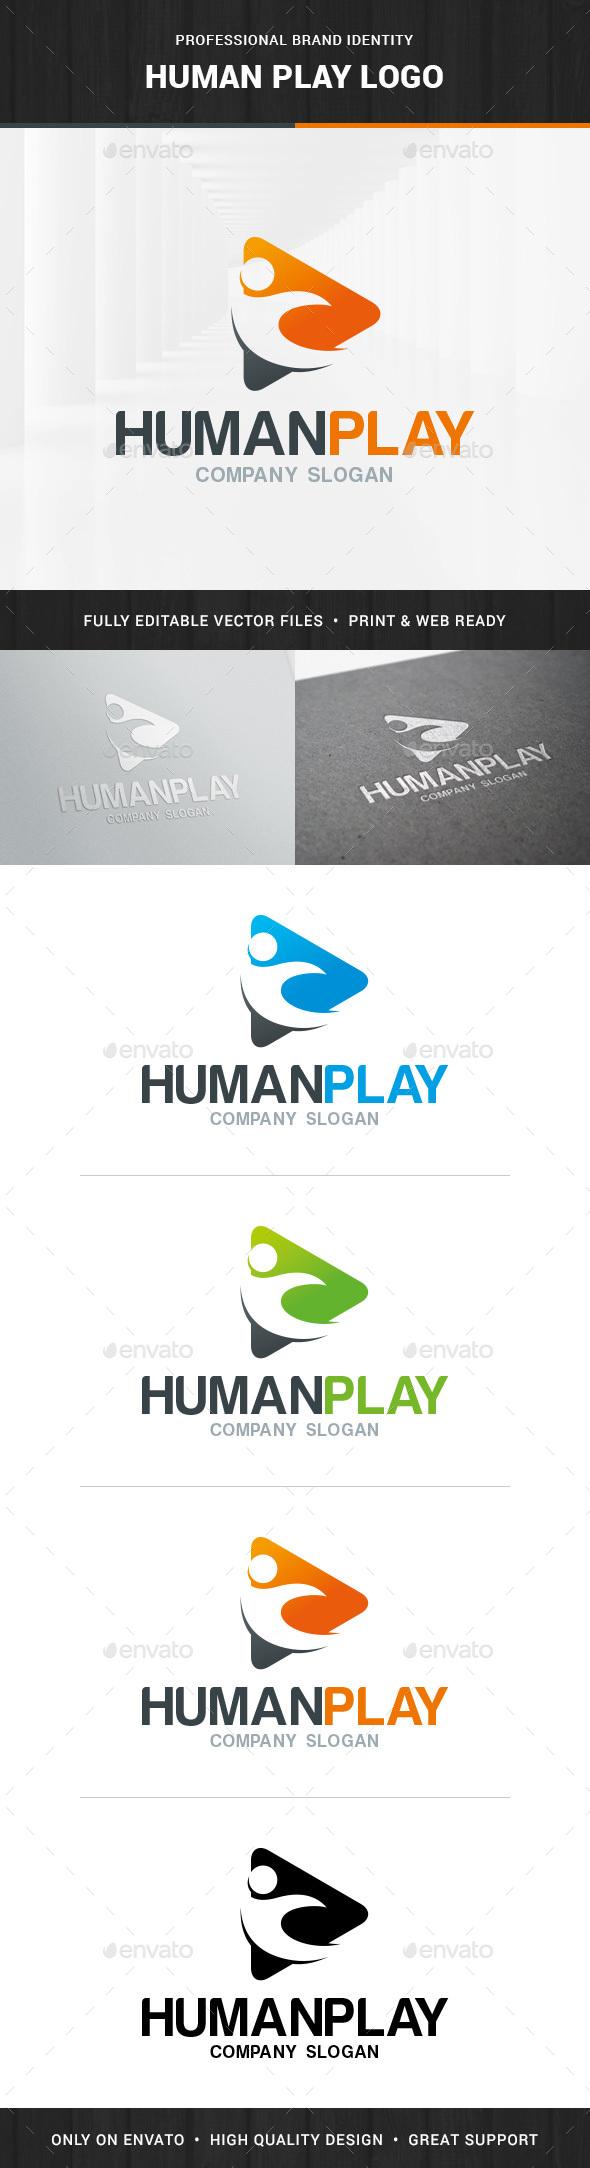 Human Play Logo Template